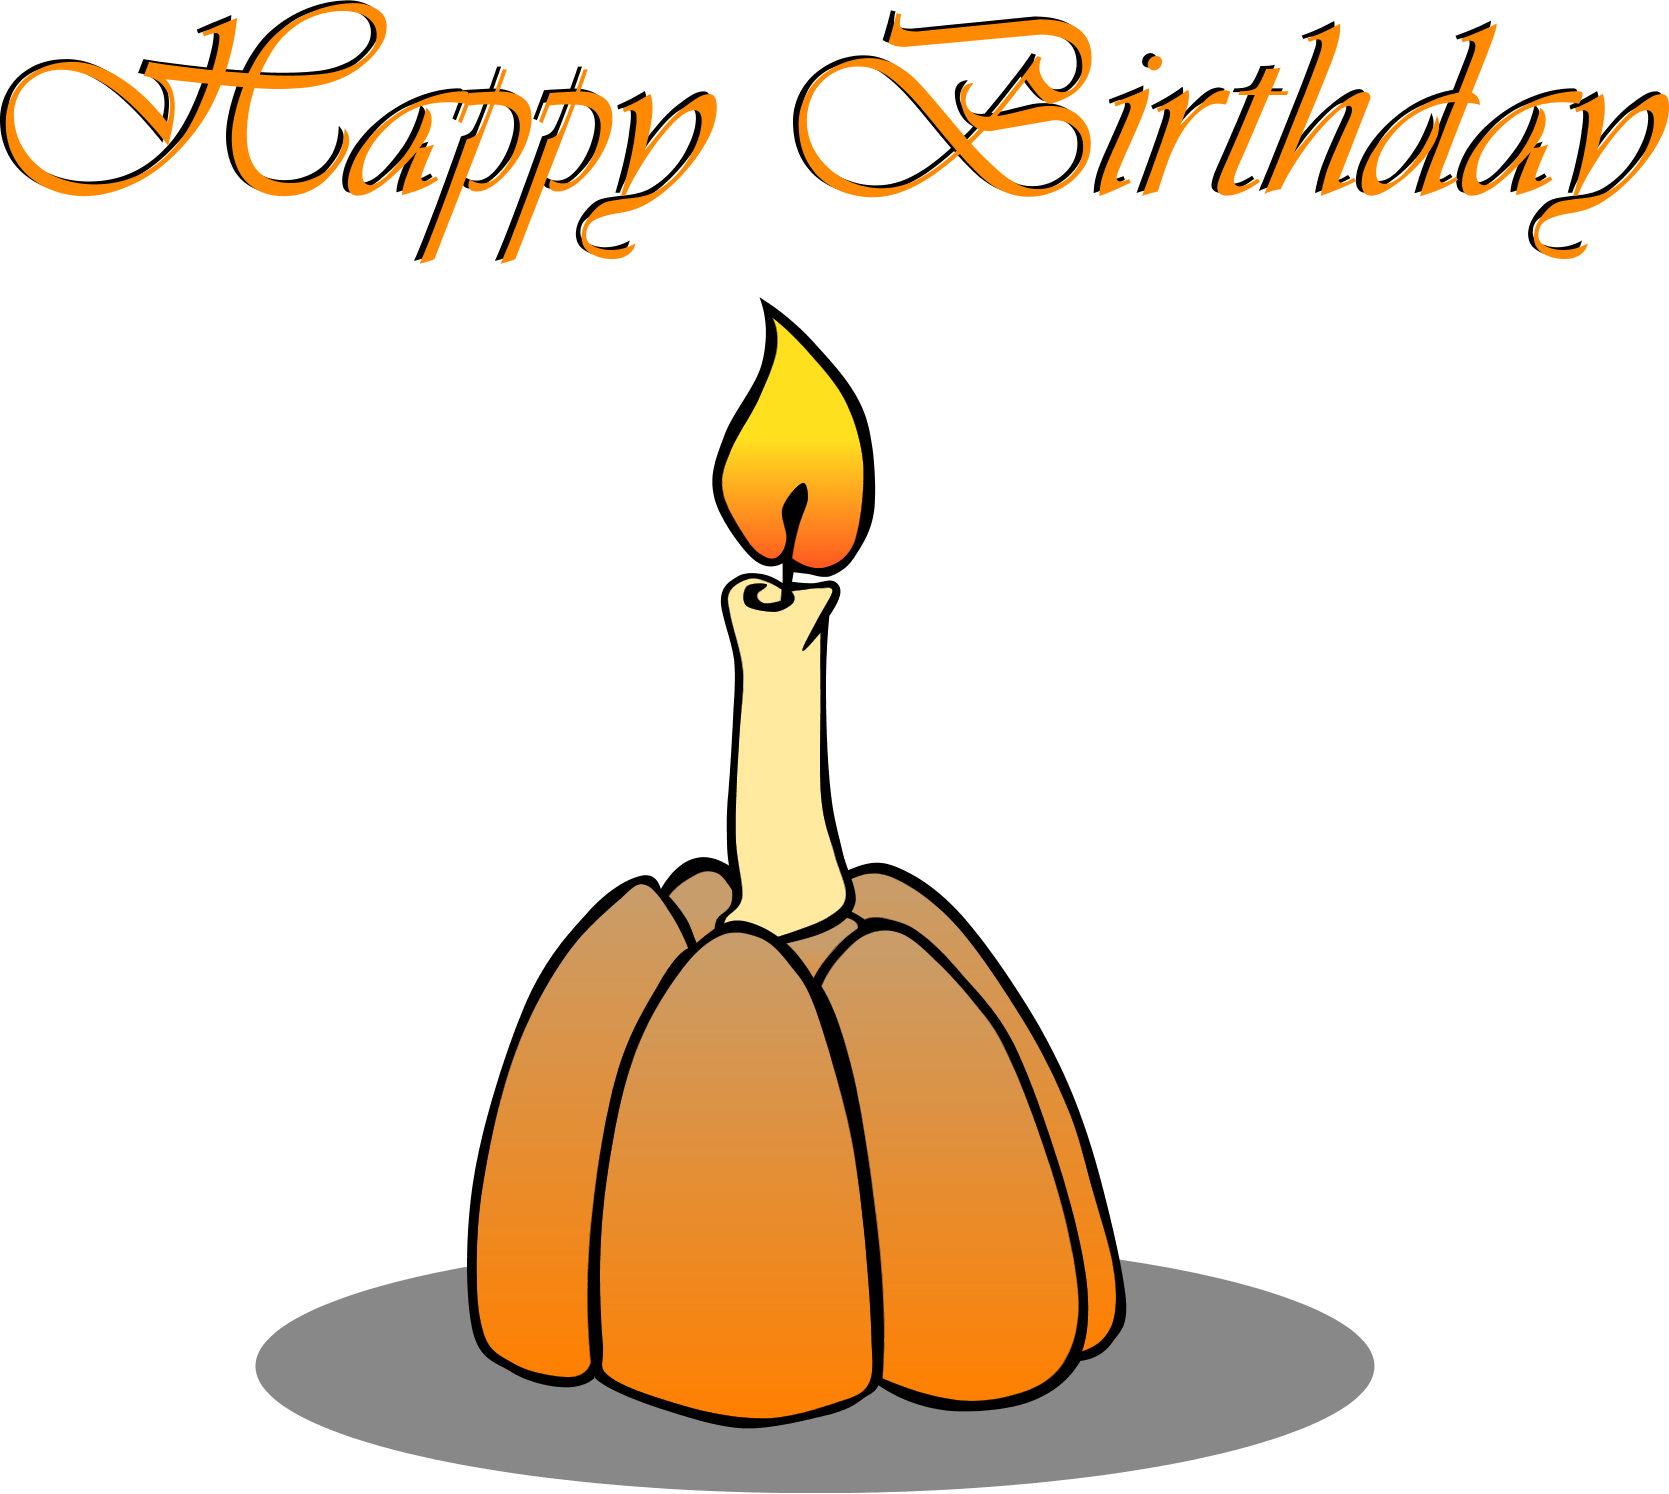 Thanksgiving Cake Clip Art : Thanksgiving Birthday Cake Clipart - Clipart Suggest